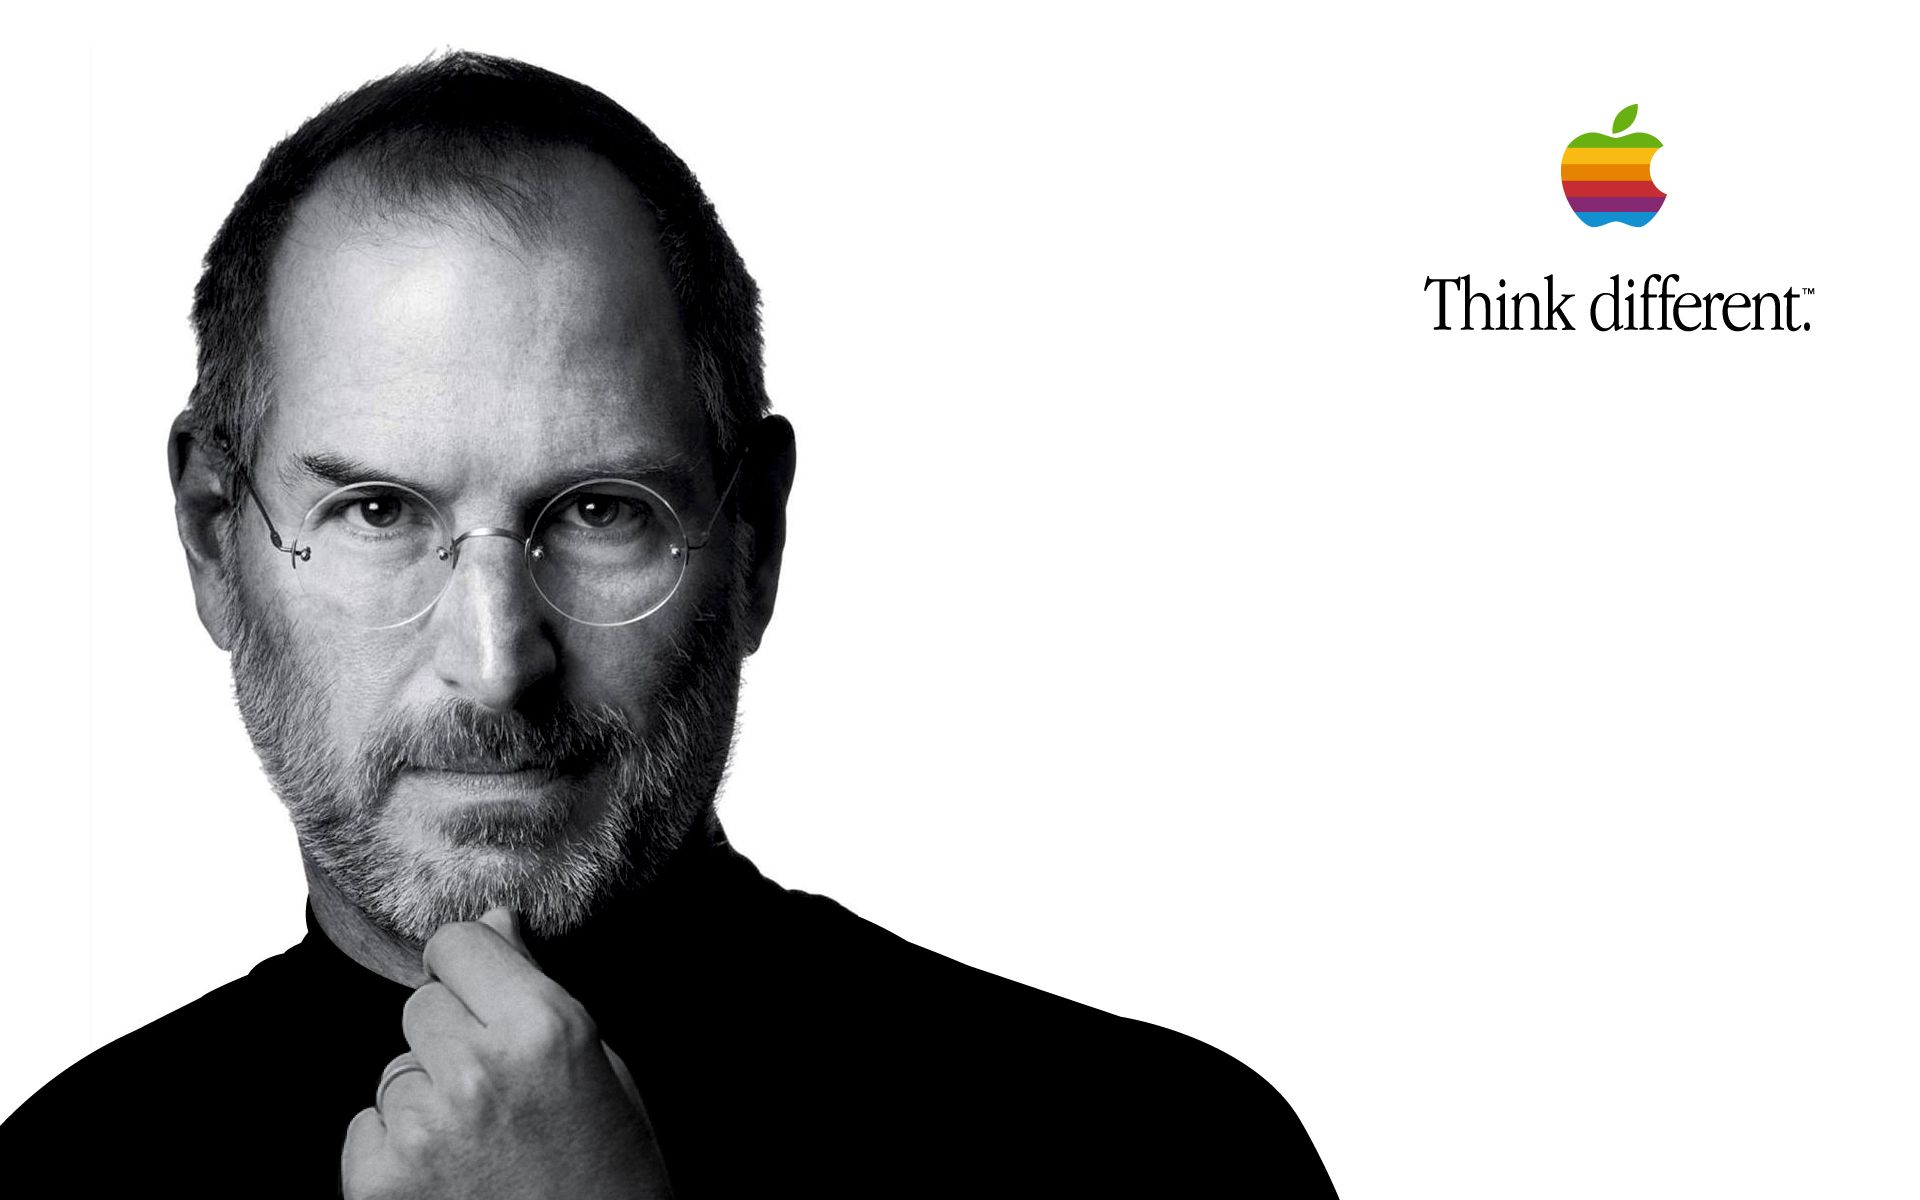 Steve Jobs Think Different By Chrisdata On Deviantart Hd